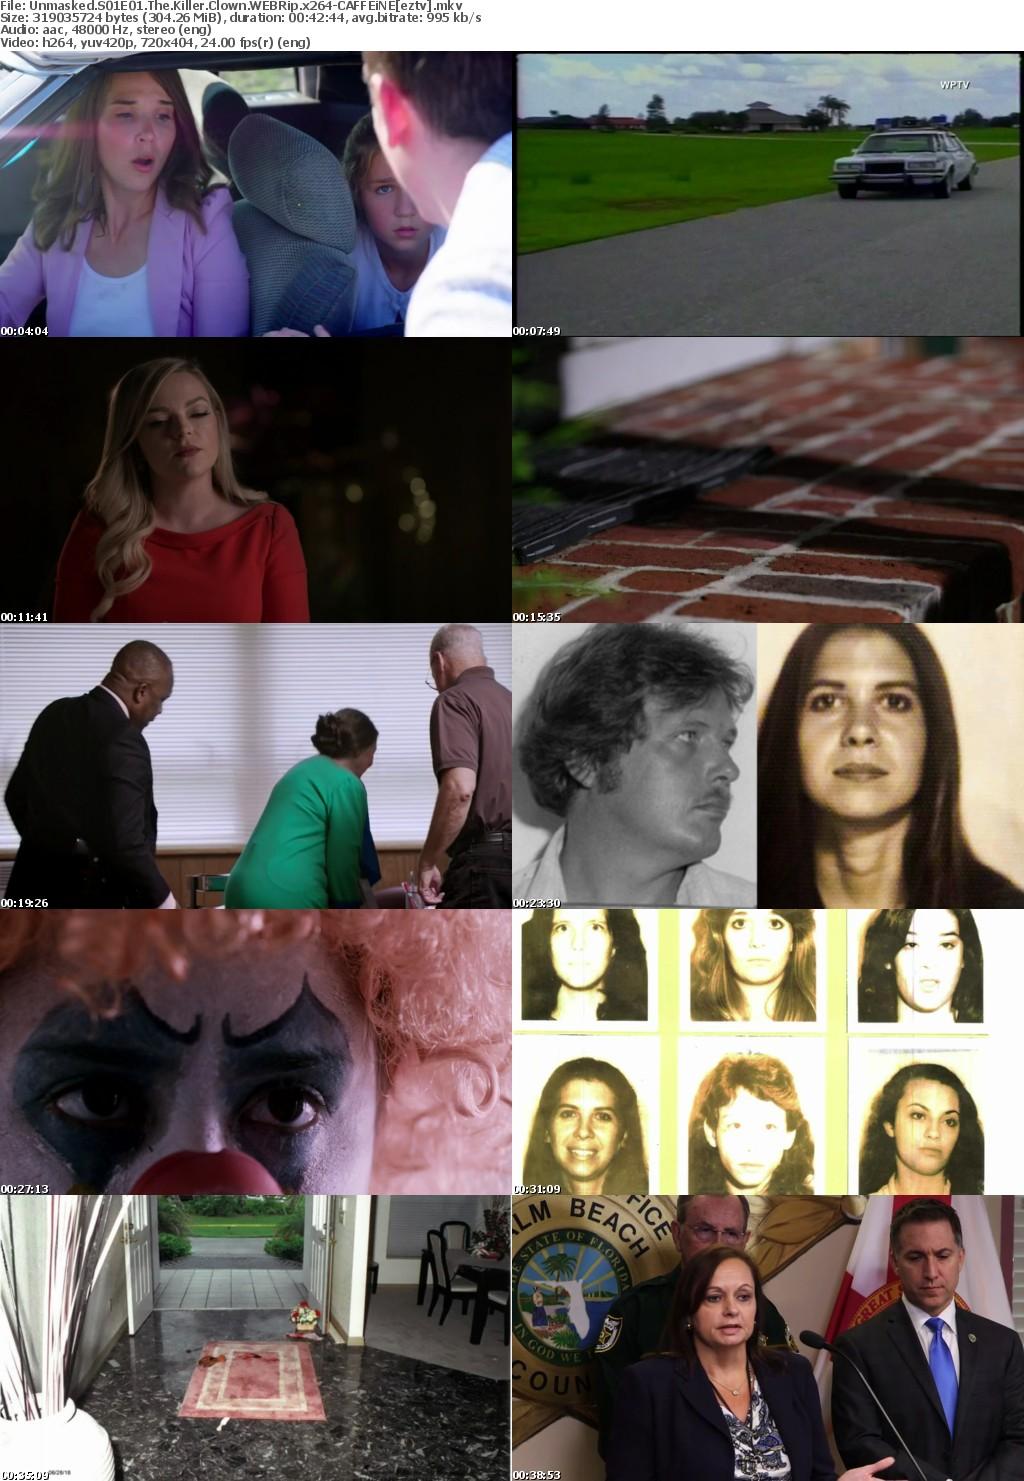 Unmasked S01E01 The Killer Clown WEBRip x264-CAFFEiNE